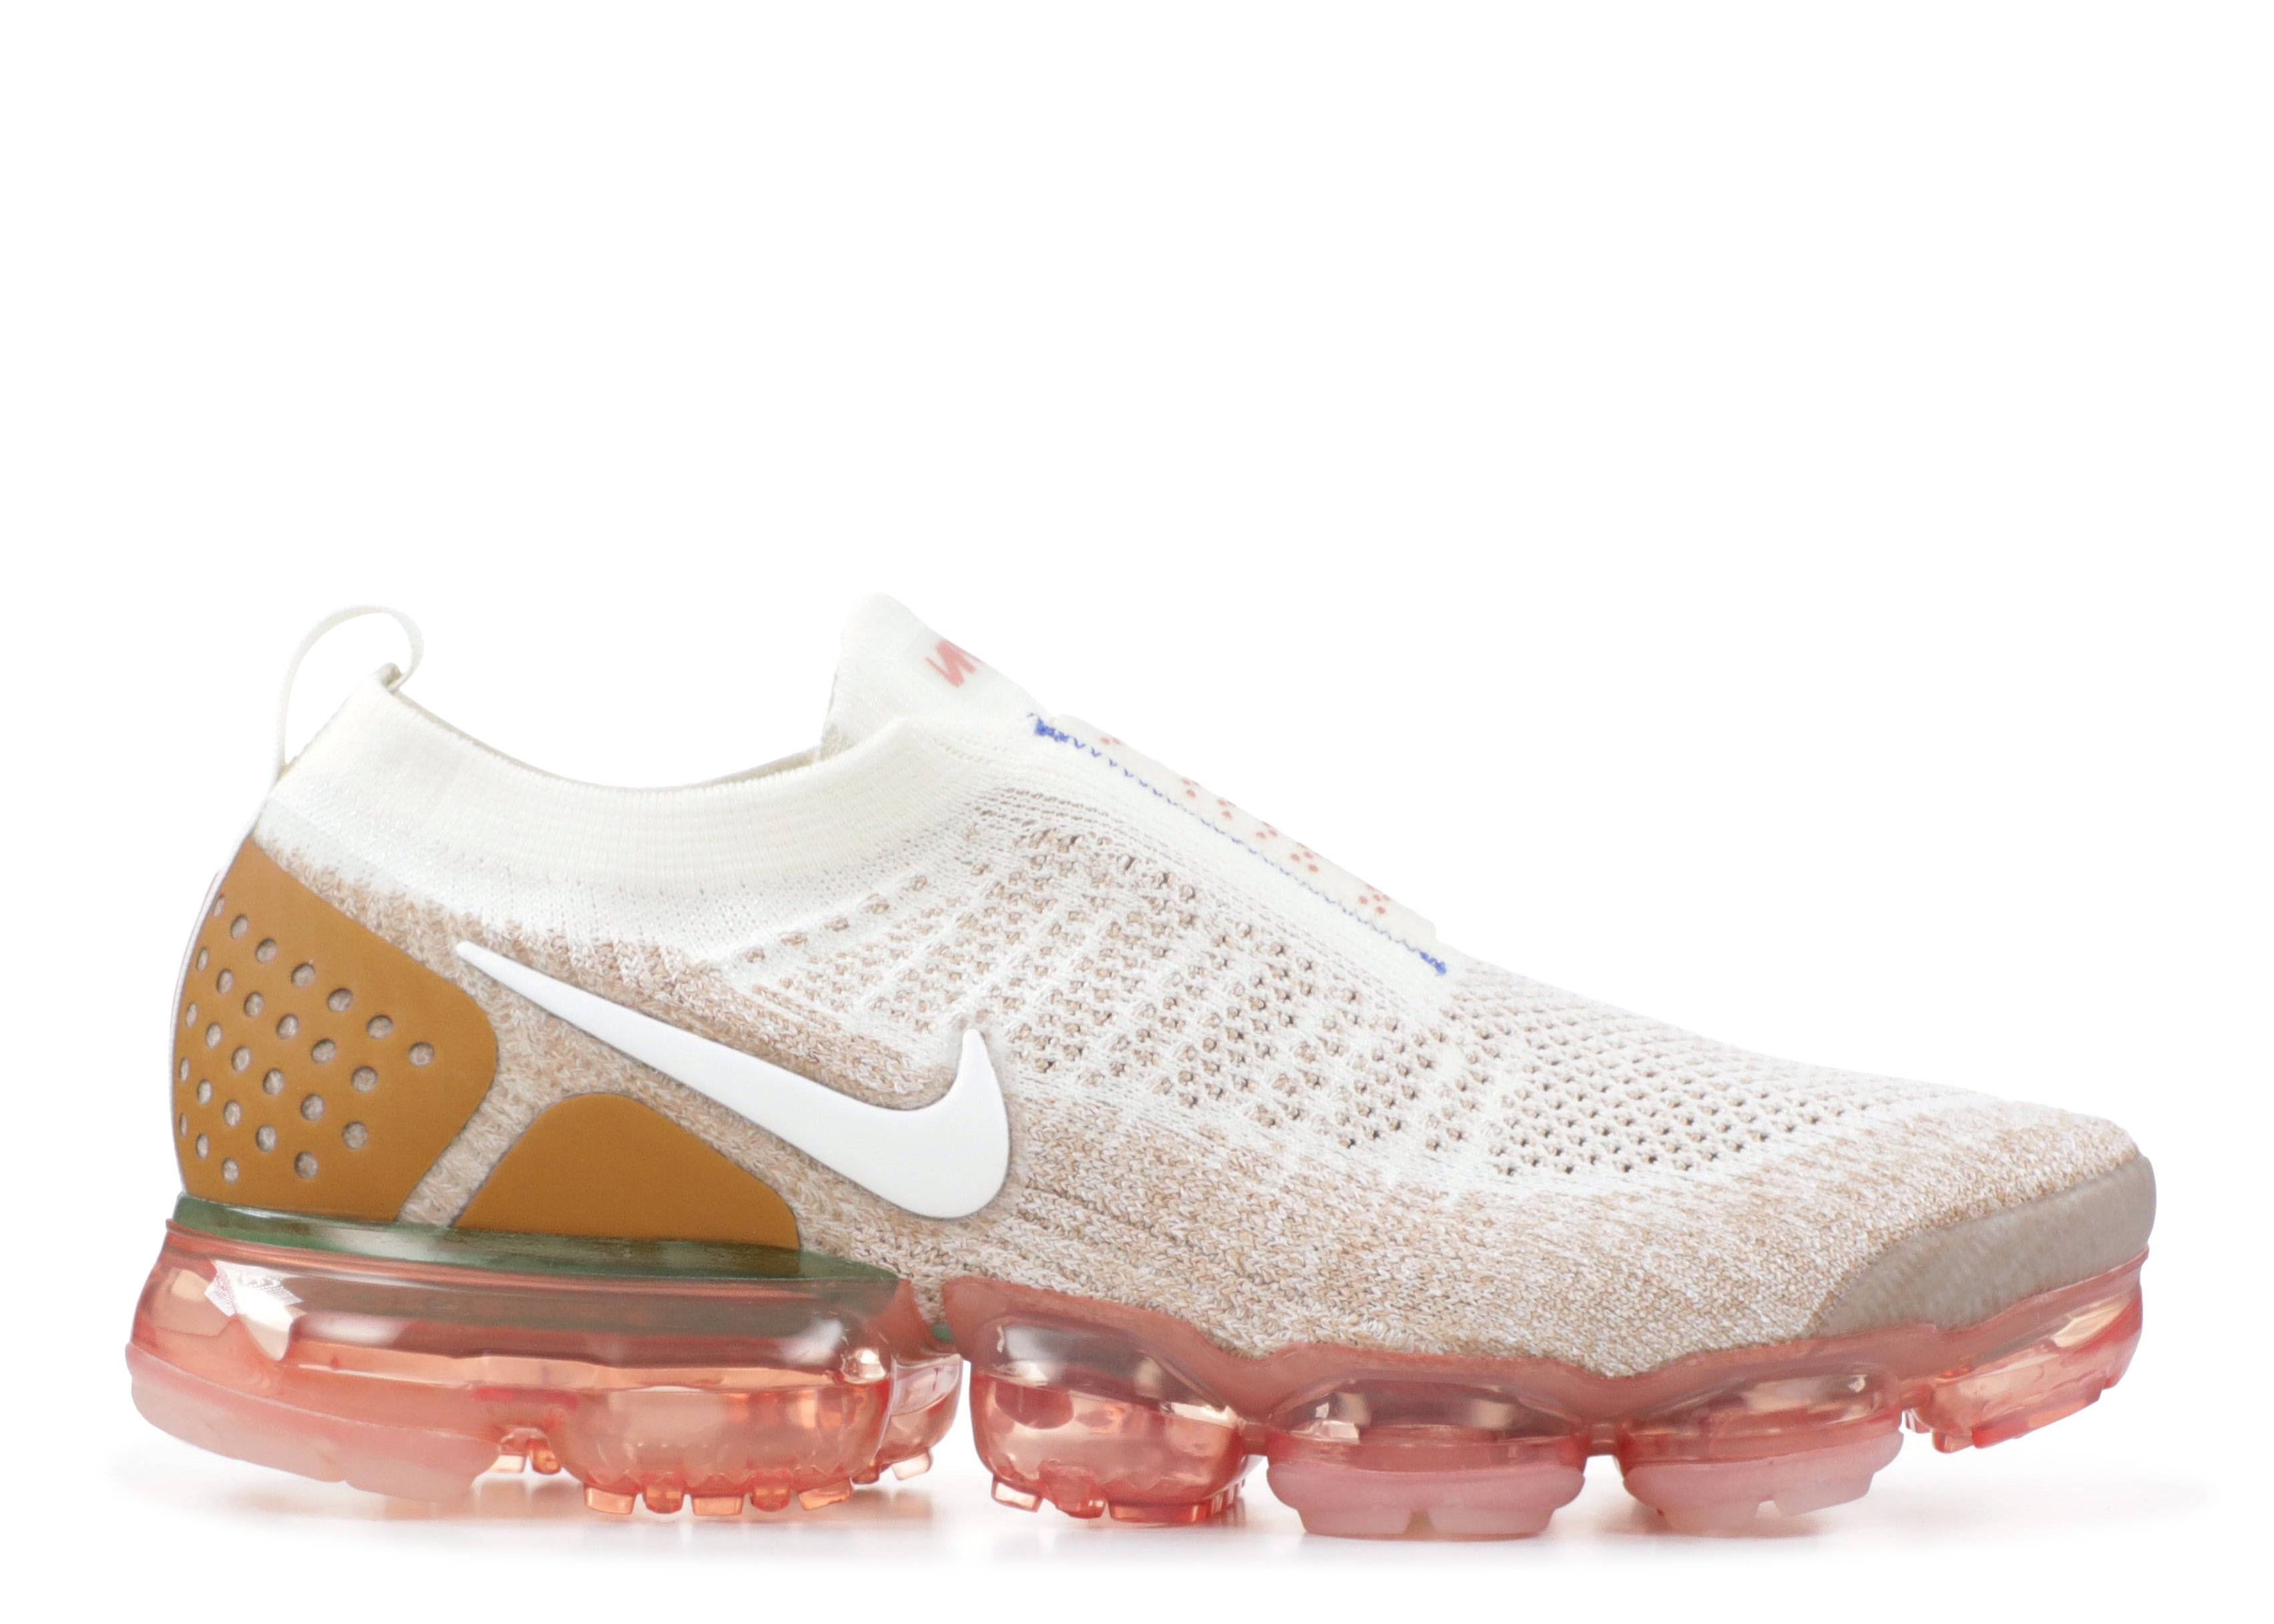 c40d27db9507a Nike Air Vapormax Fk Moc 2